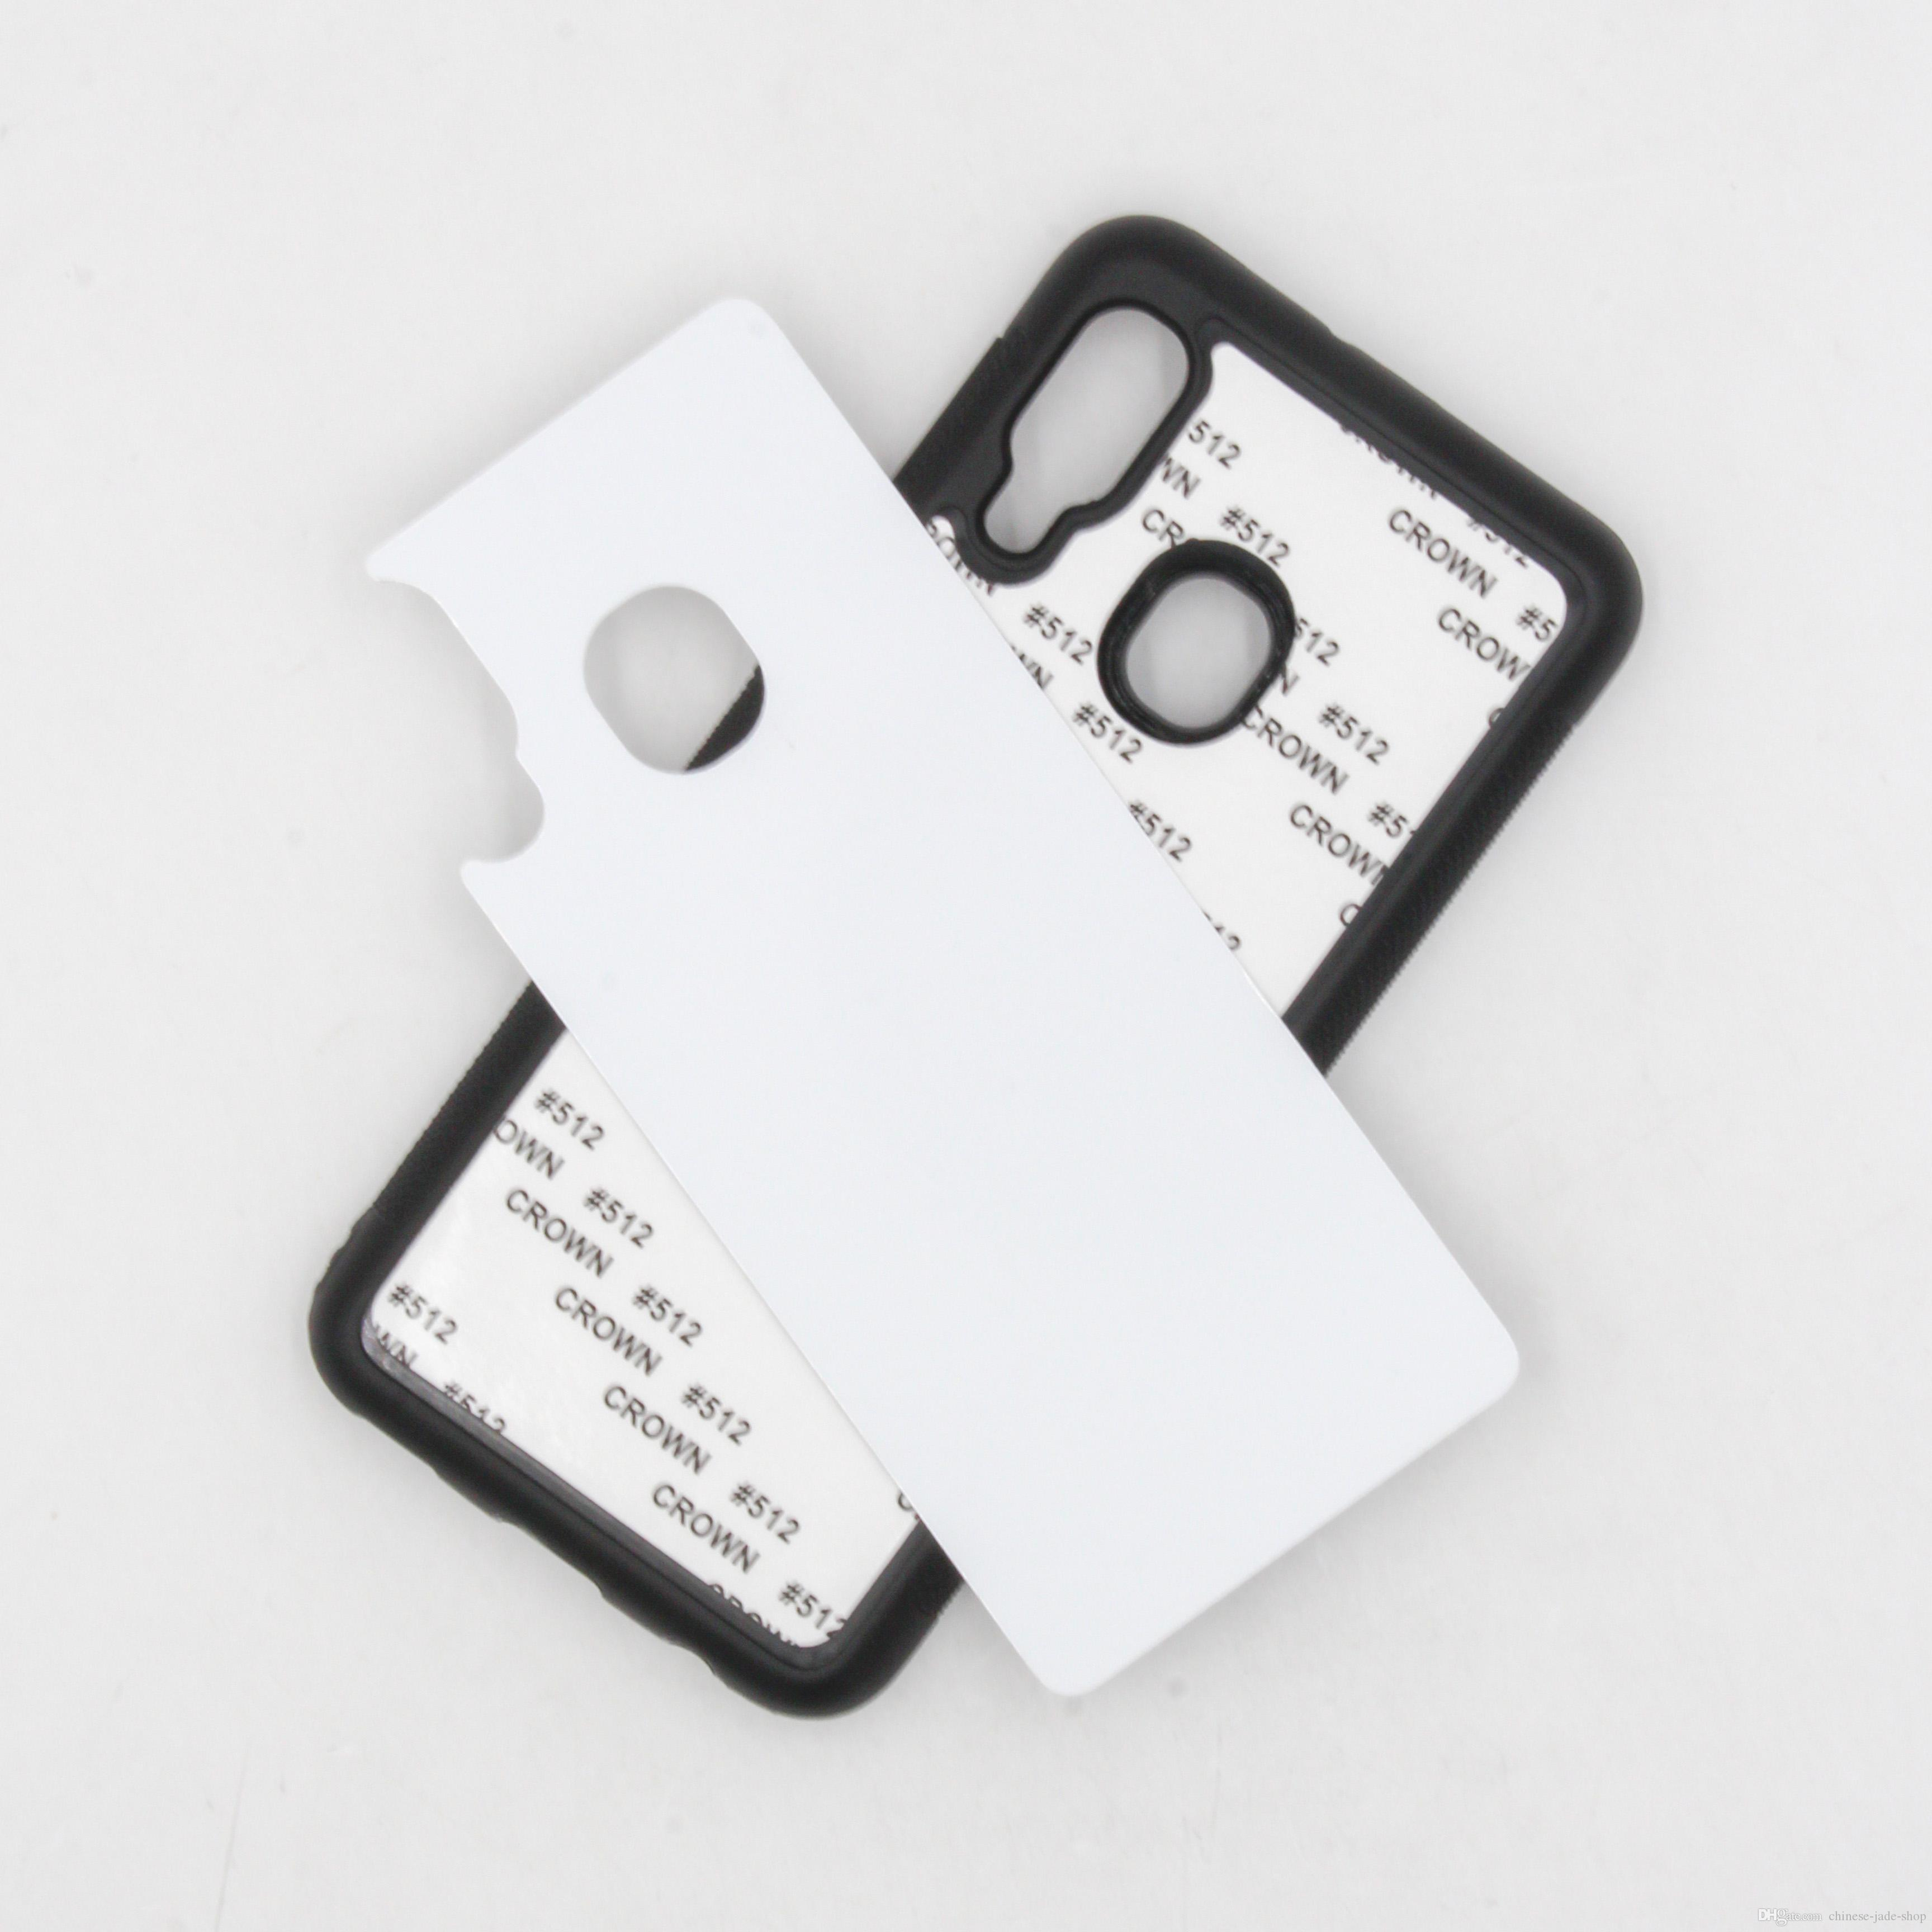 Rubber TPU DIY Sublimatie Case met aluminium metalen lijm voor Samsung Galaxy A10S A20S A10E A20E S10 5G A60 100PCS / PARTIJ